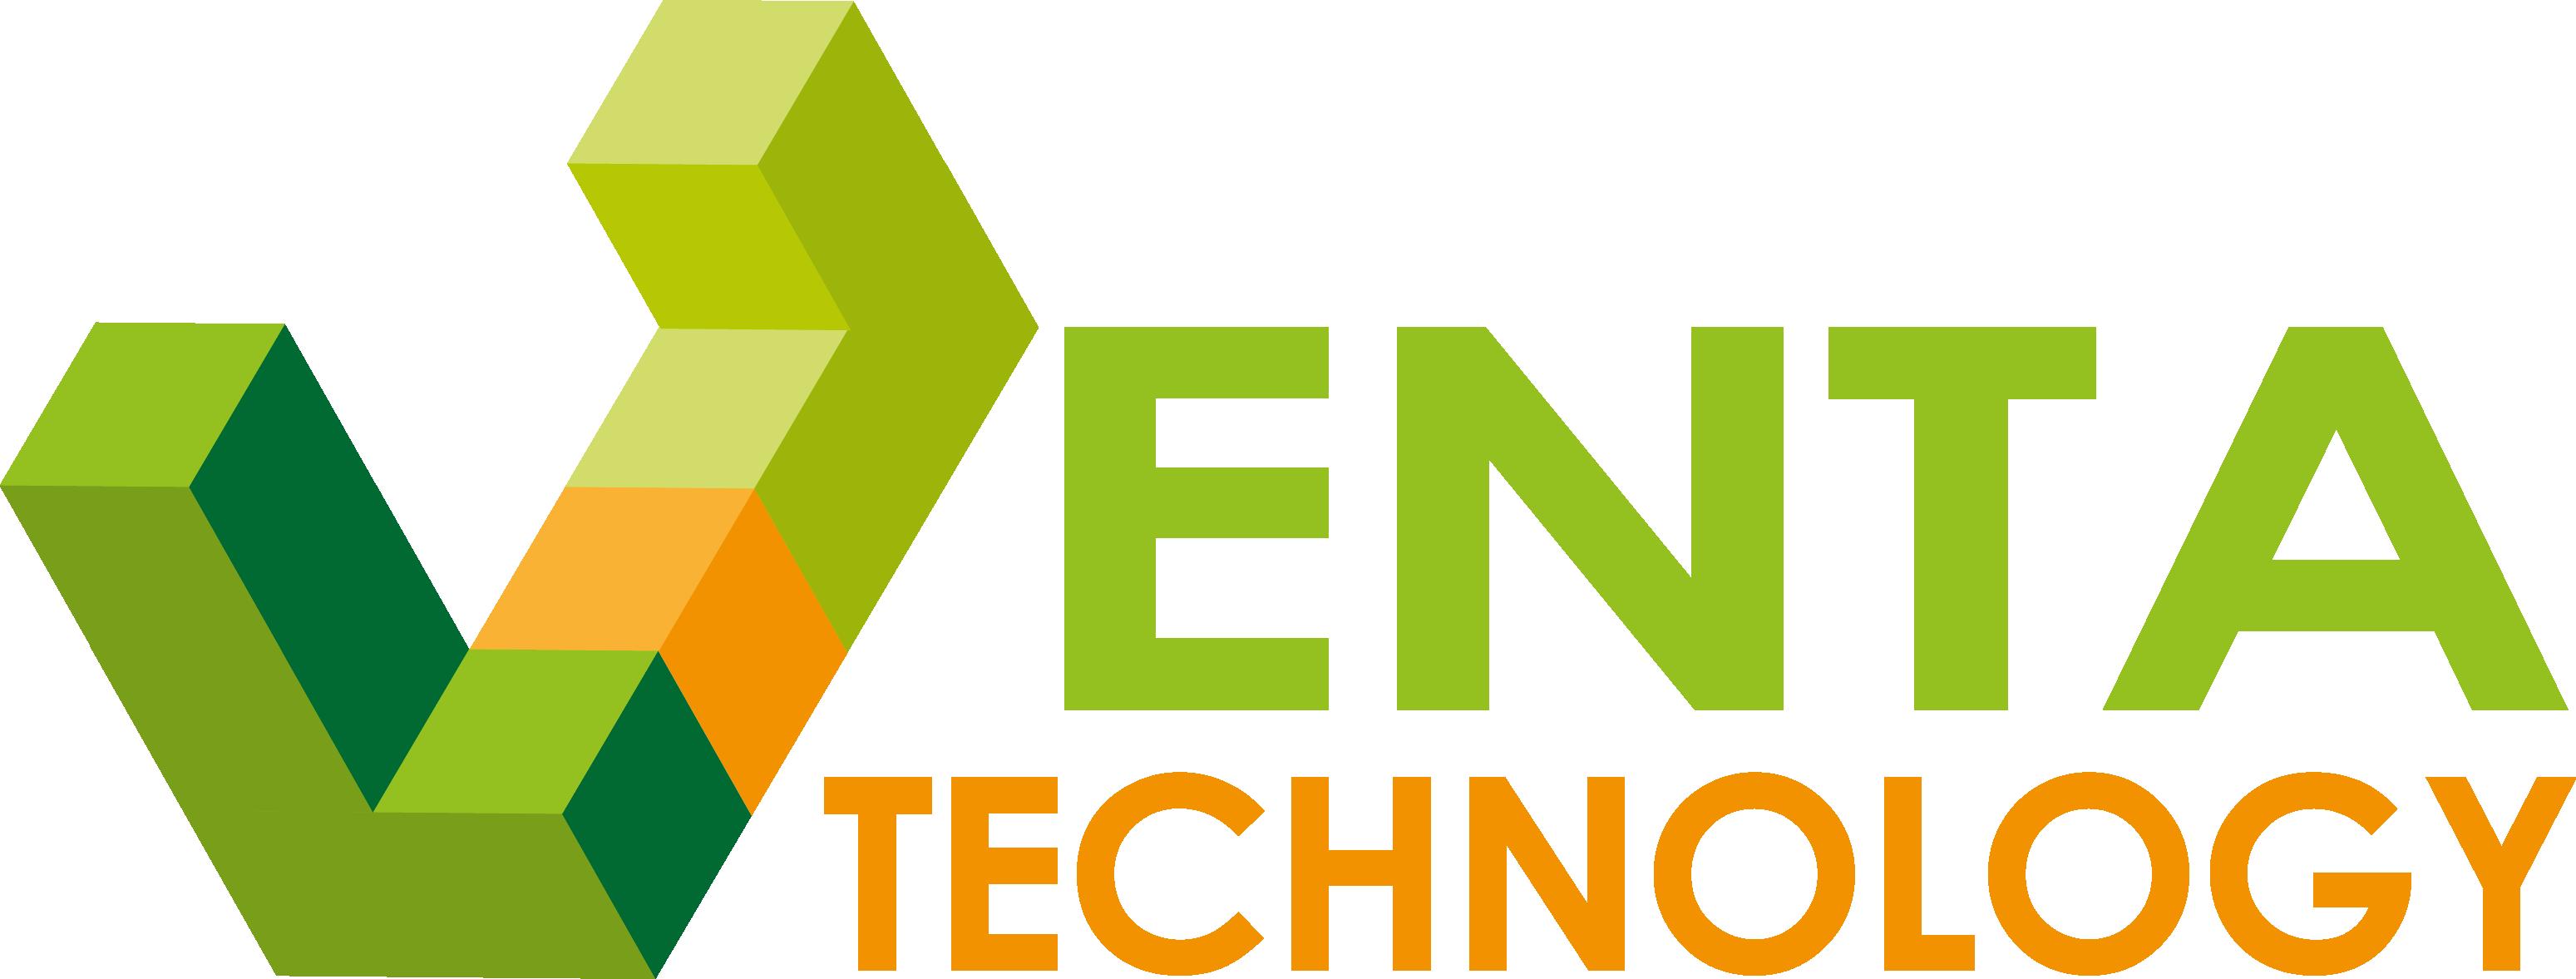 Venta-Technology